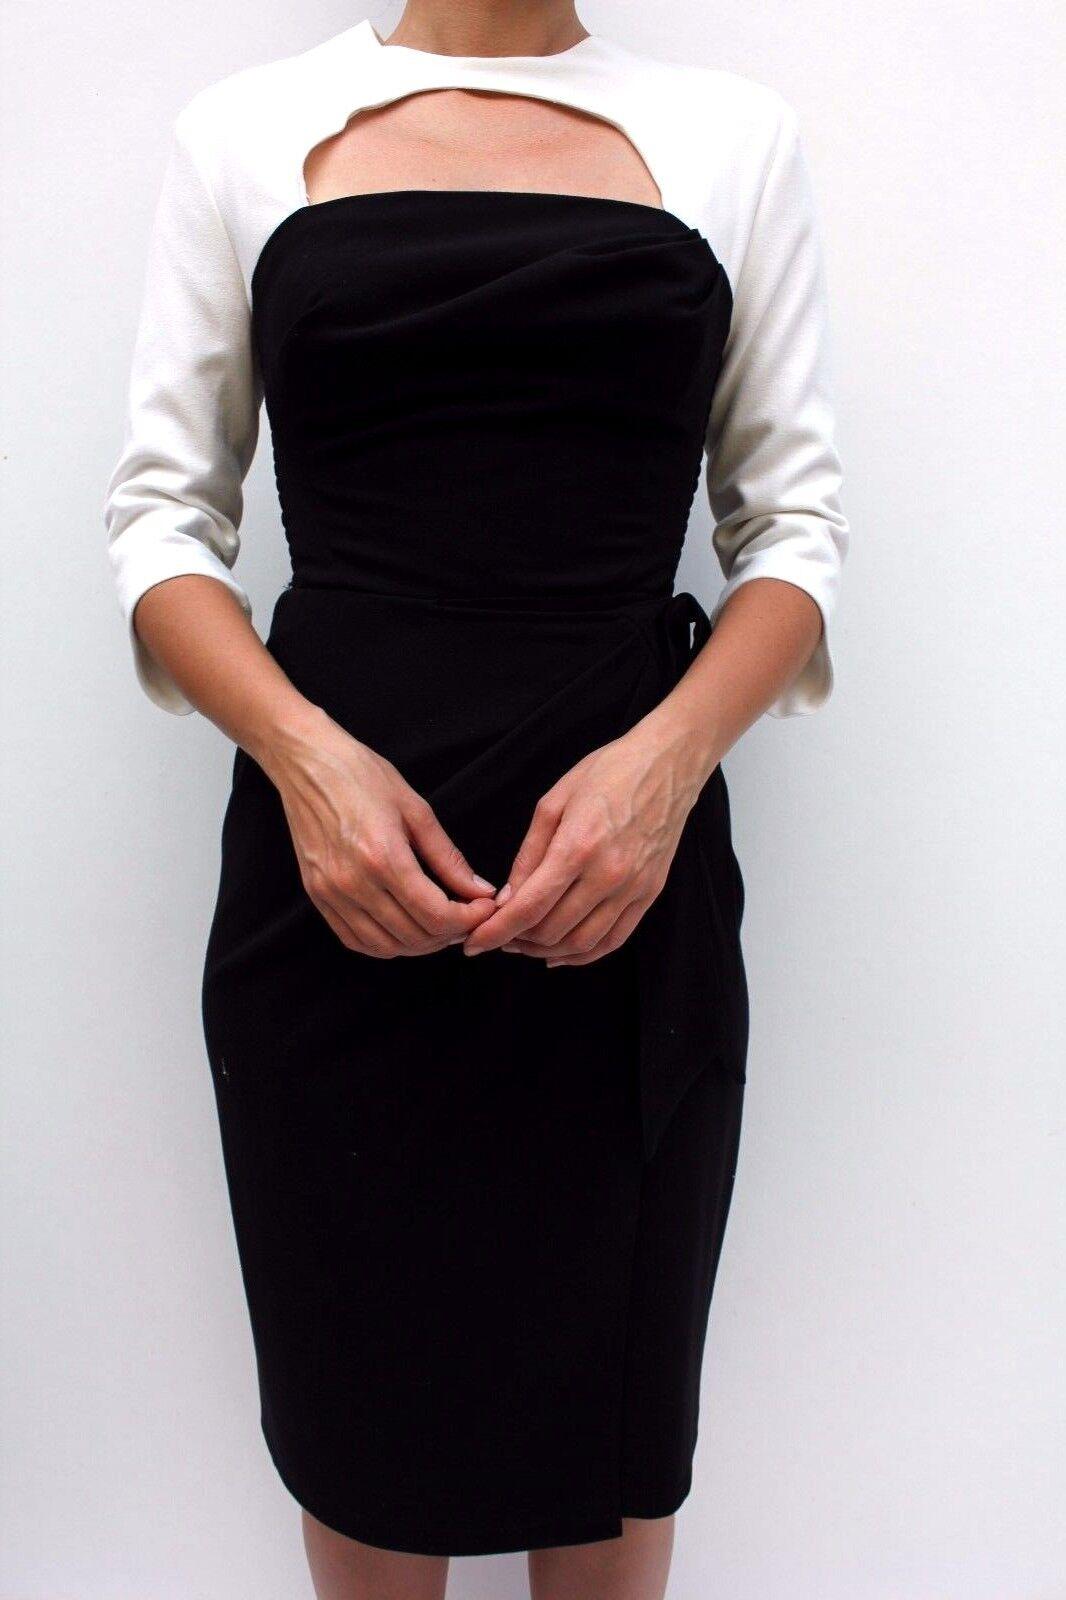 Bombshell Katya Wildman Mono Crepe Moss Office Occasion Pencil Dress Dress Dress 8 36 New | Hohe Qualität Und Geringen Overhead  | Elegante Und Stabile Verpackung  ace171